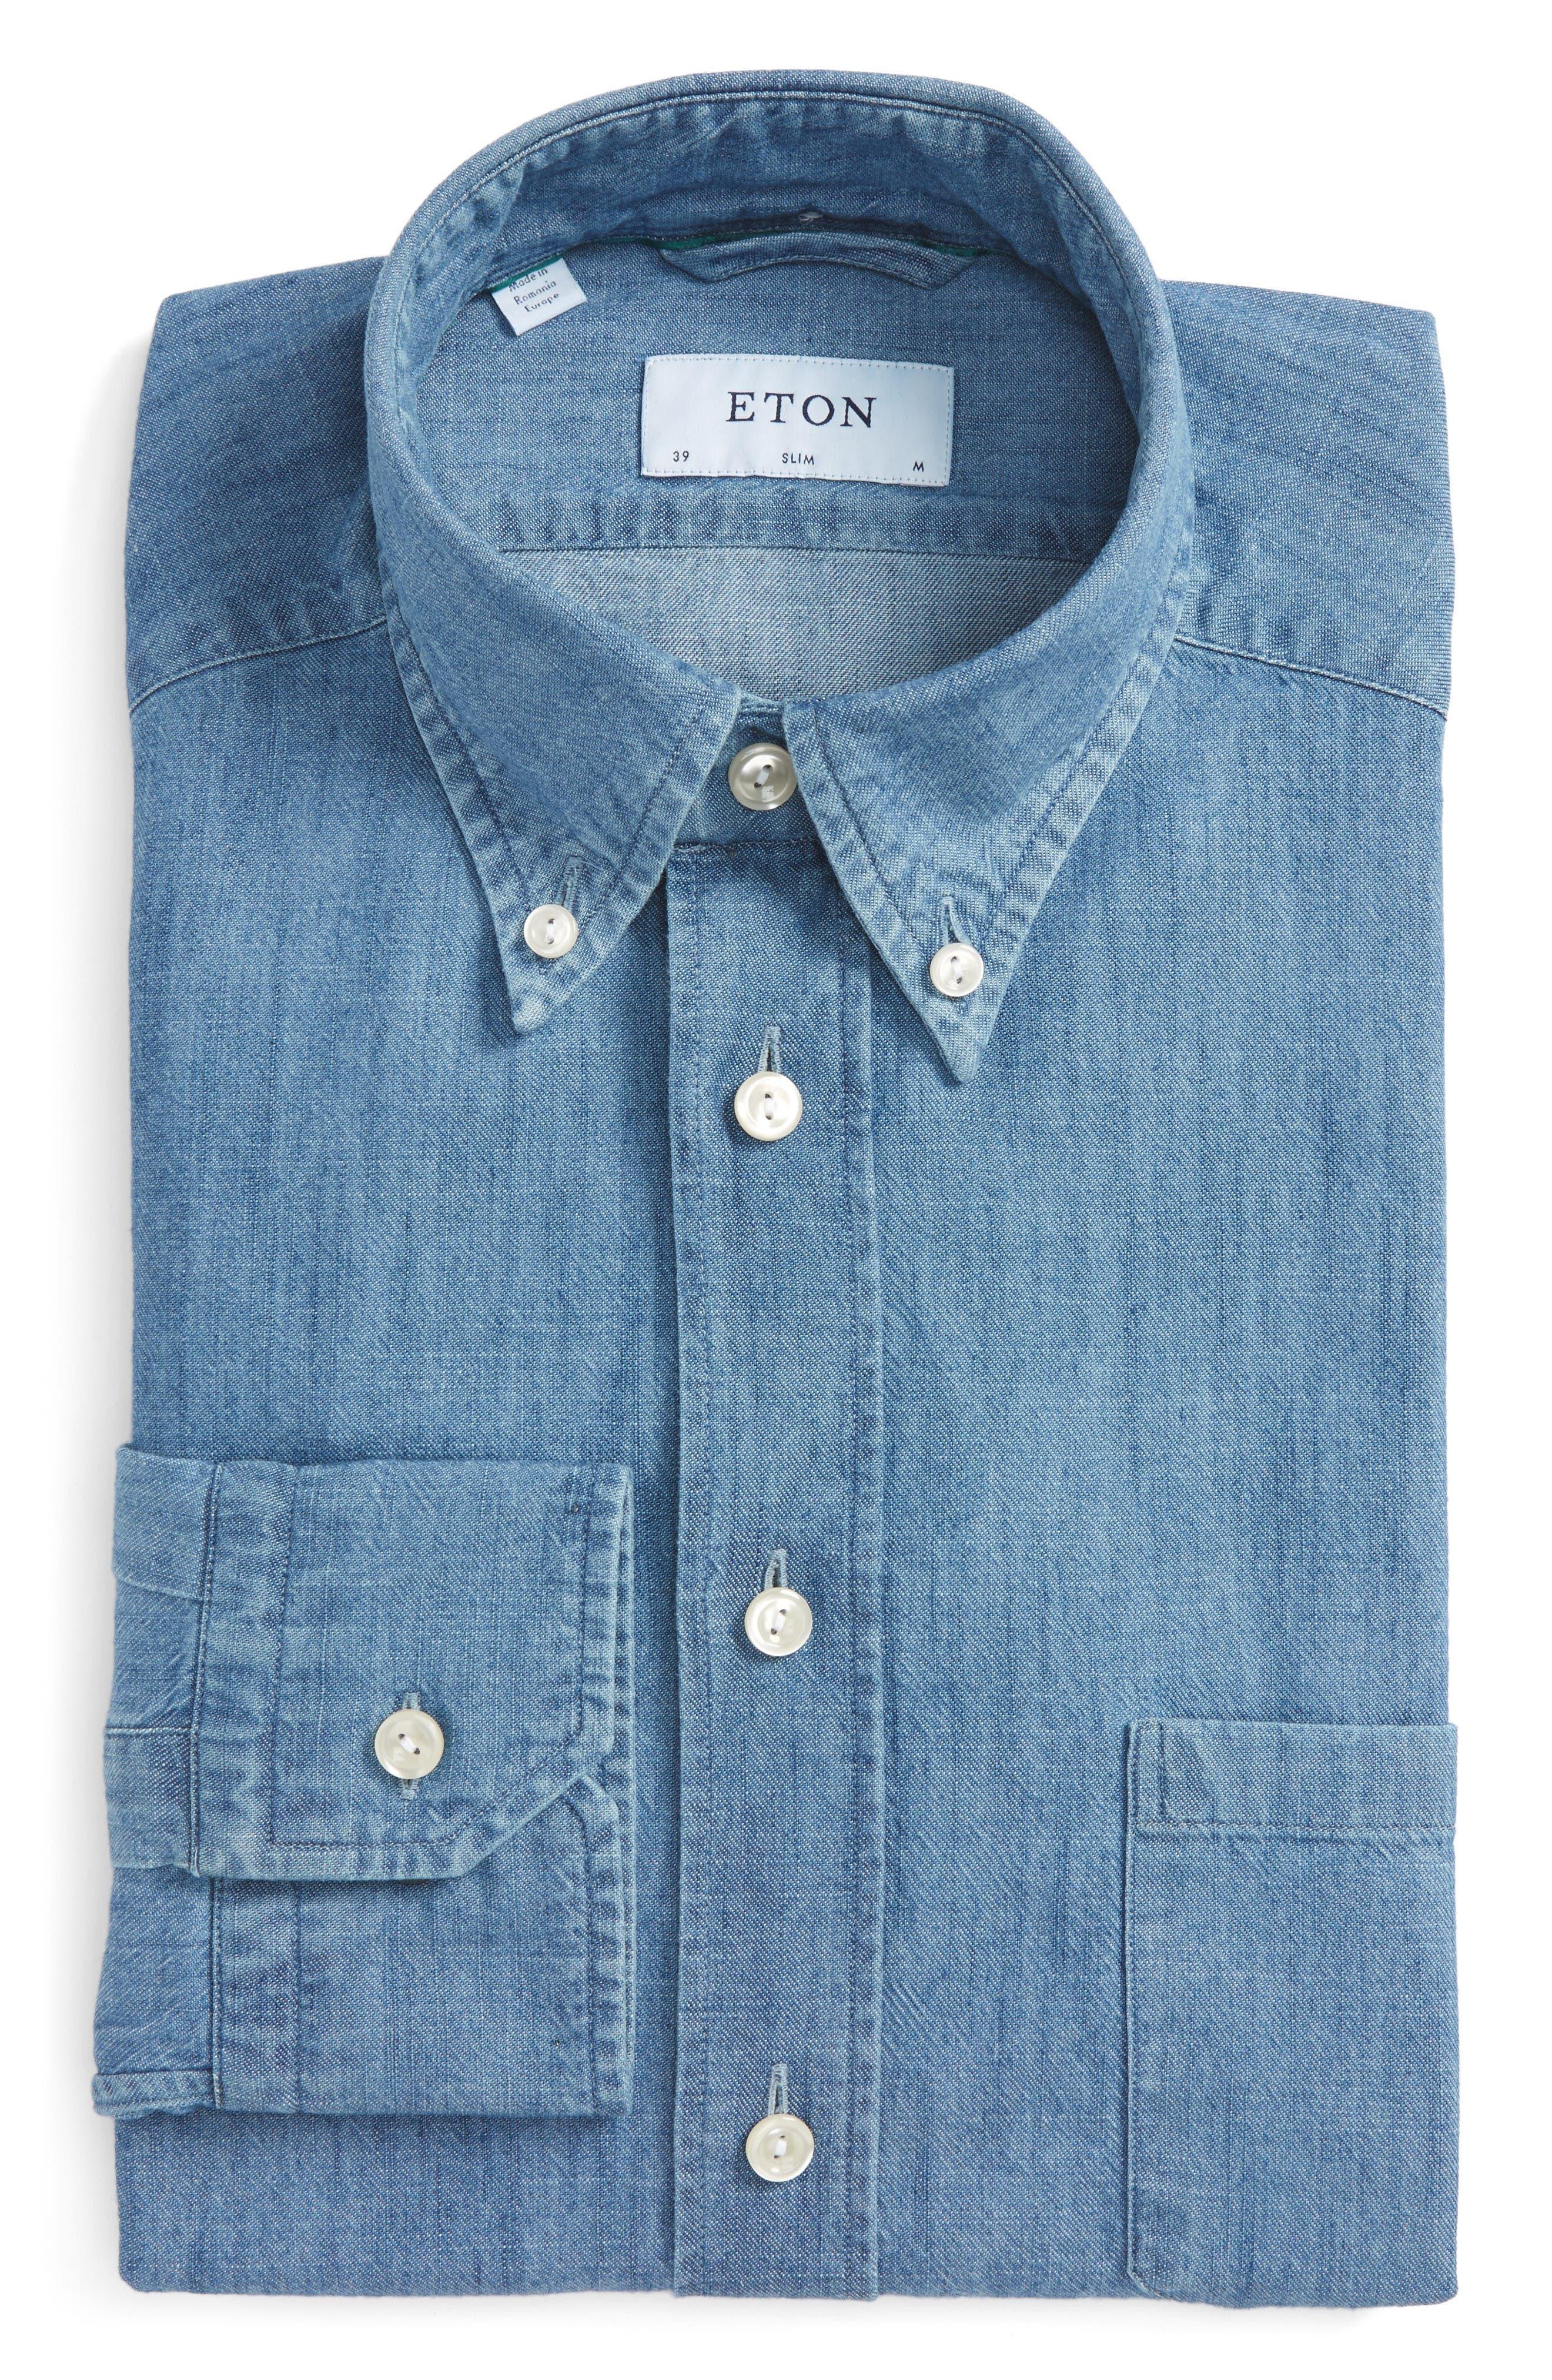 Main Image - Eton Slim Fit Chambray Dress Shirt